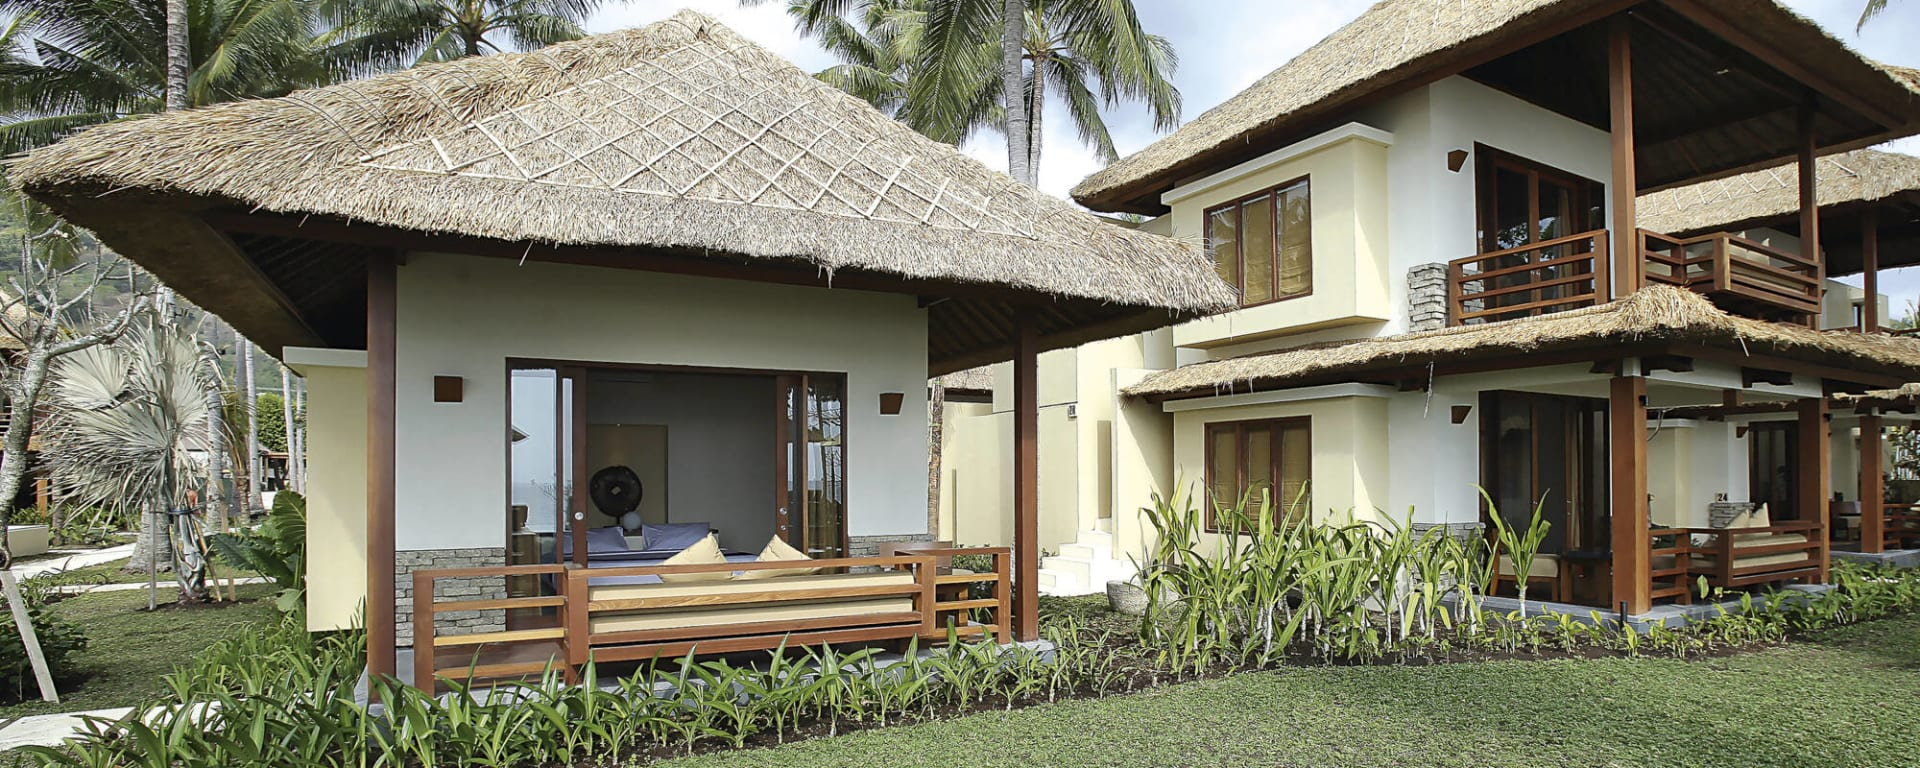 Qunci Boutique Hotel & Villas in Lombok: Lombok Qunci Boutique Hotel and Vilas